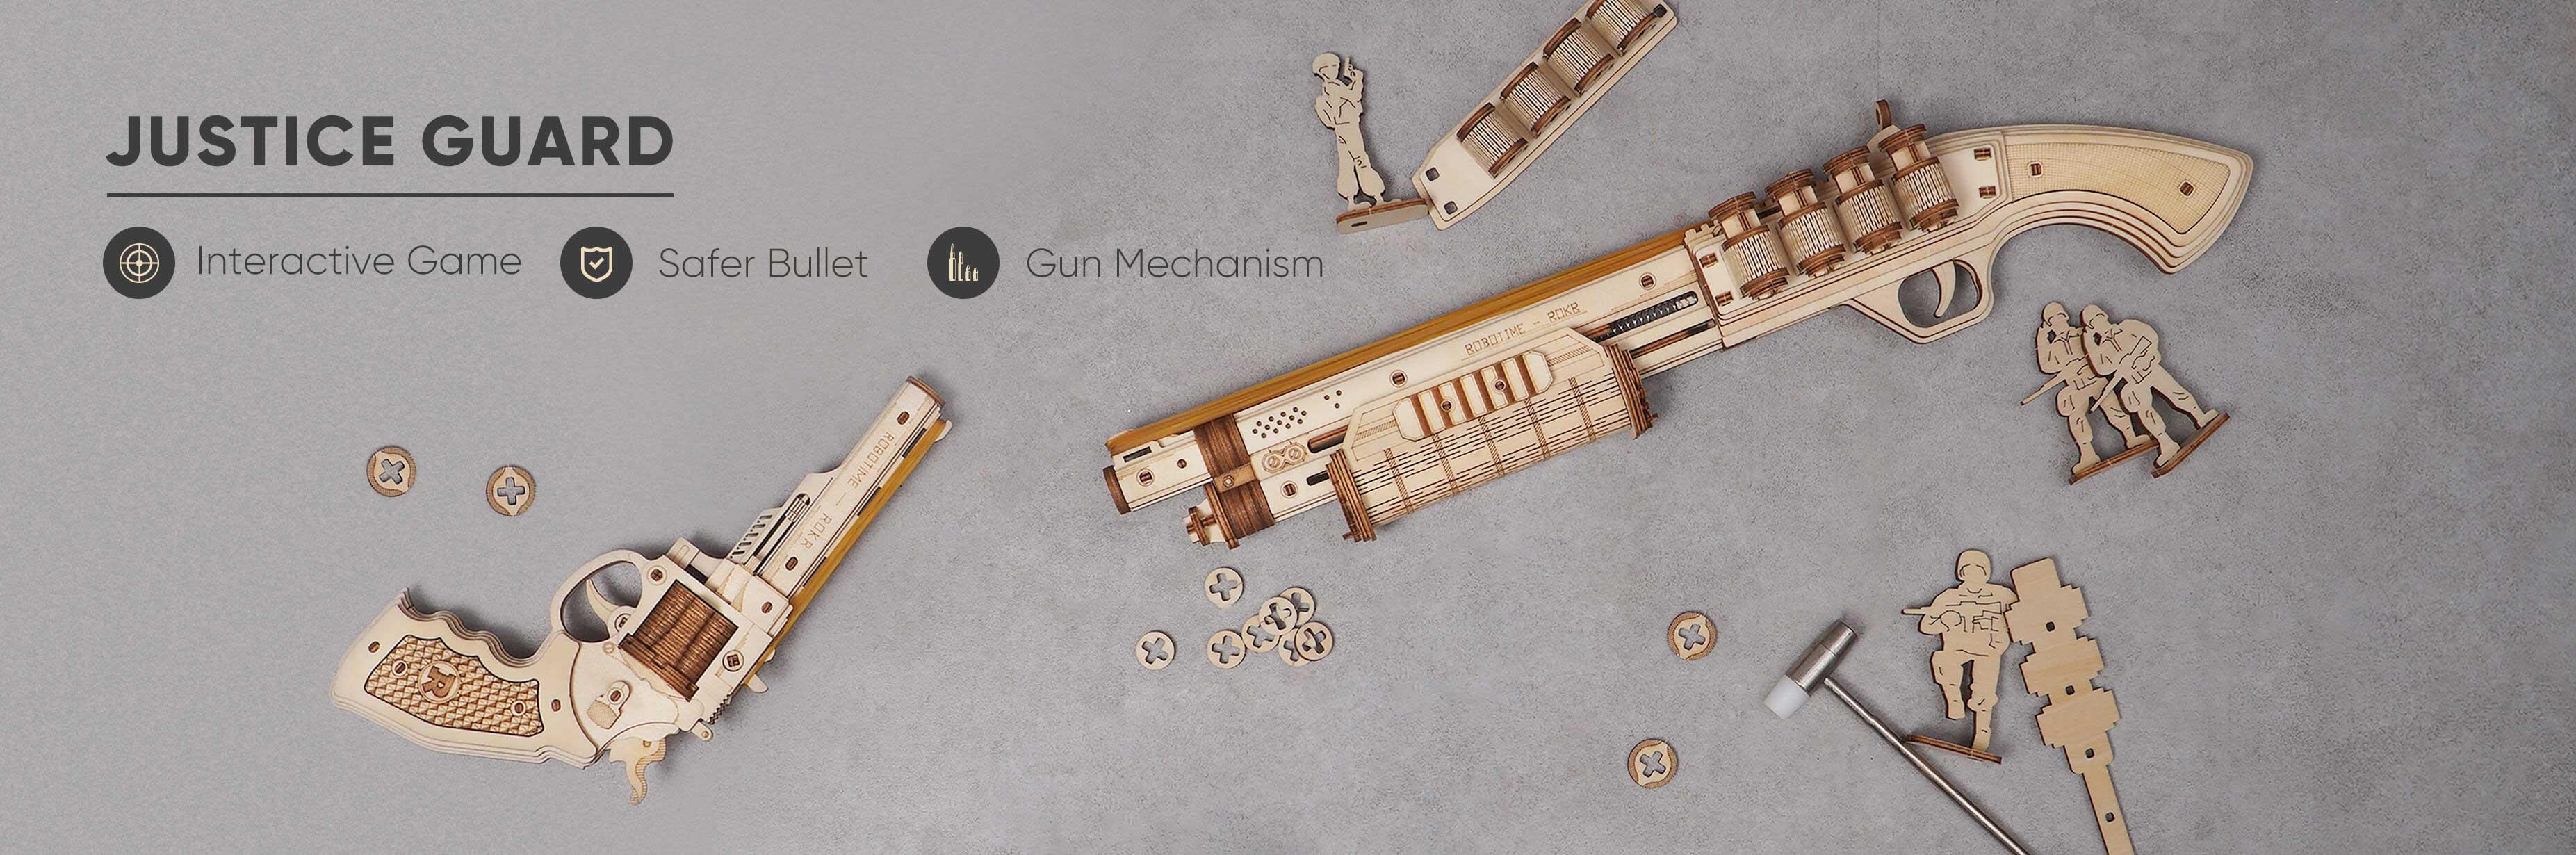 ROKR Justice Guard gun toys series